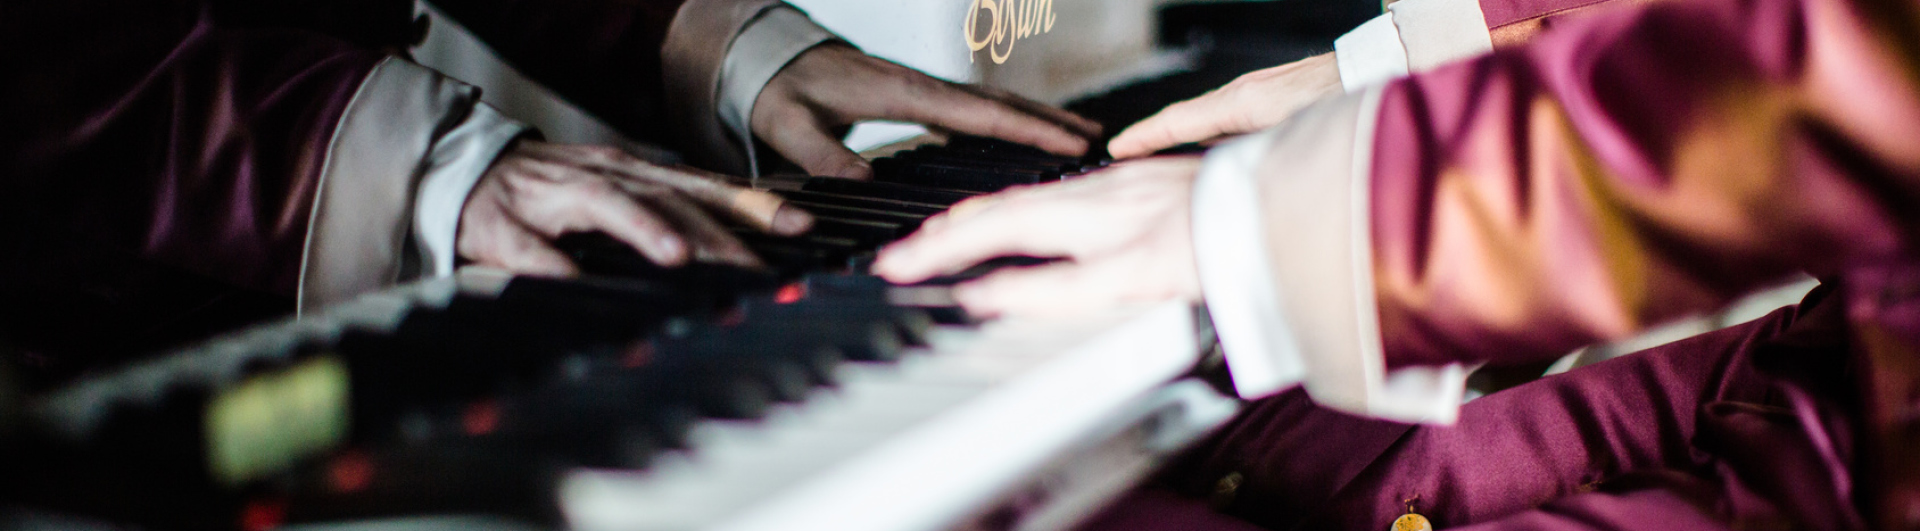 Pianist am Piano spielen